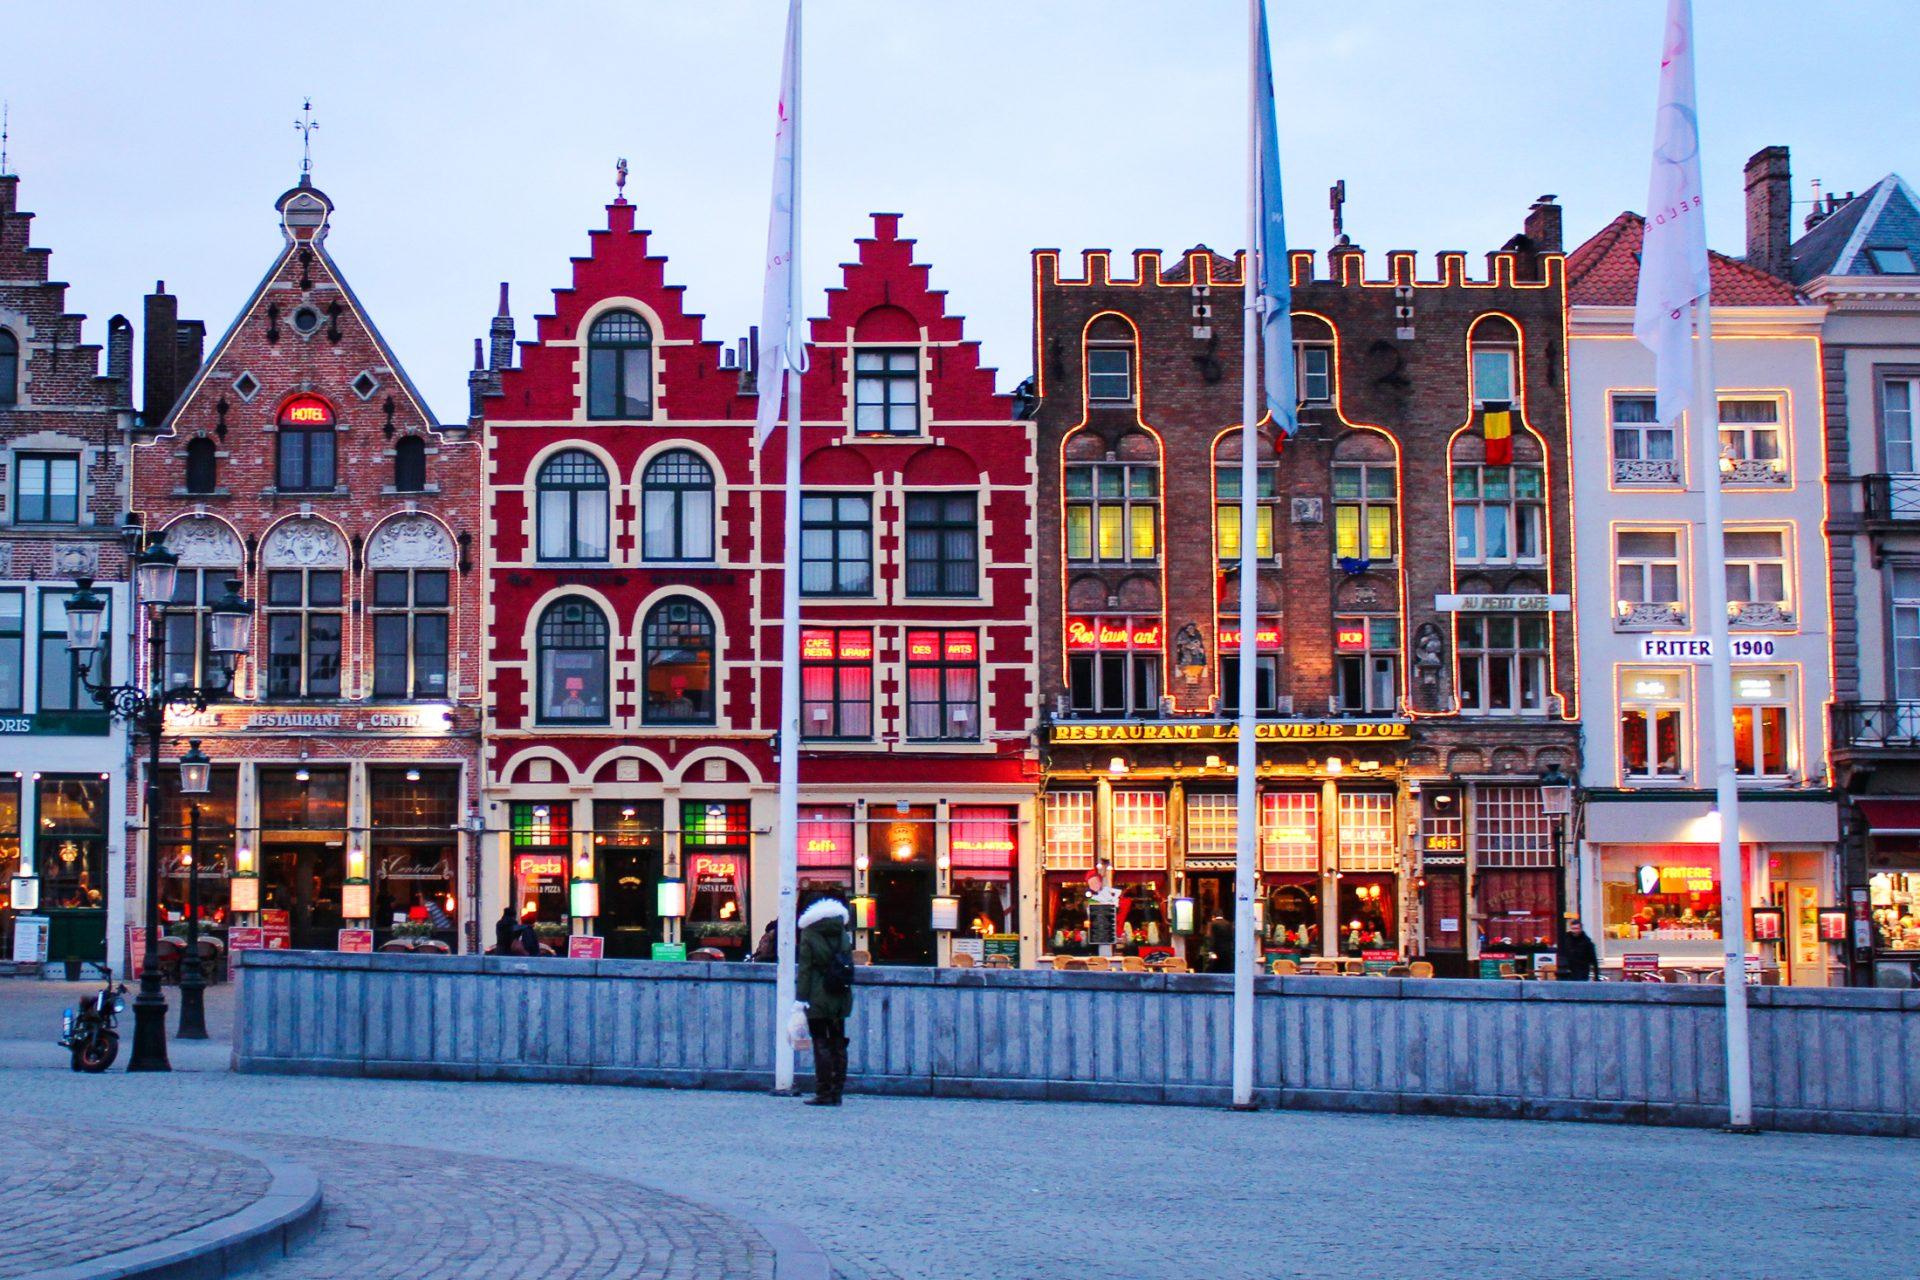 Colourful building facades in Bruges, Belgium